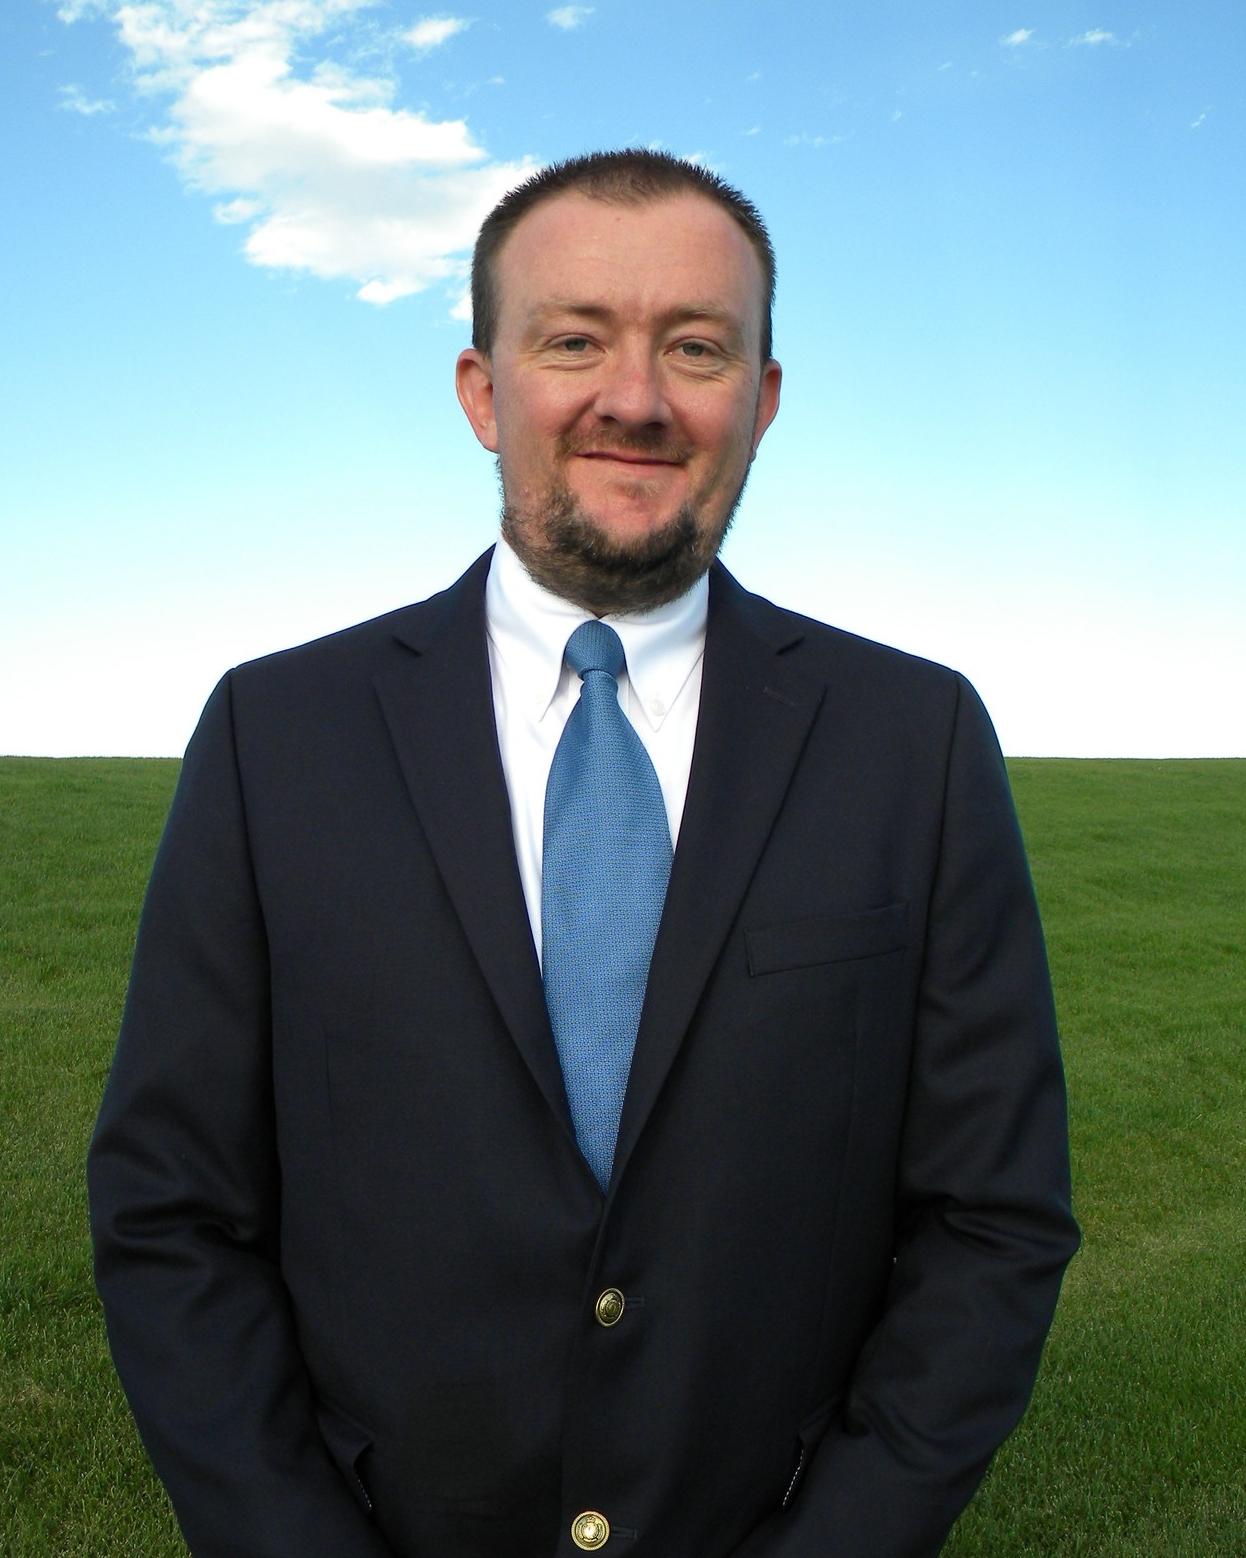 Brian Hedberg, Principal